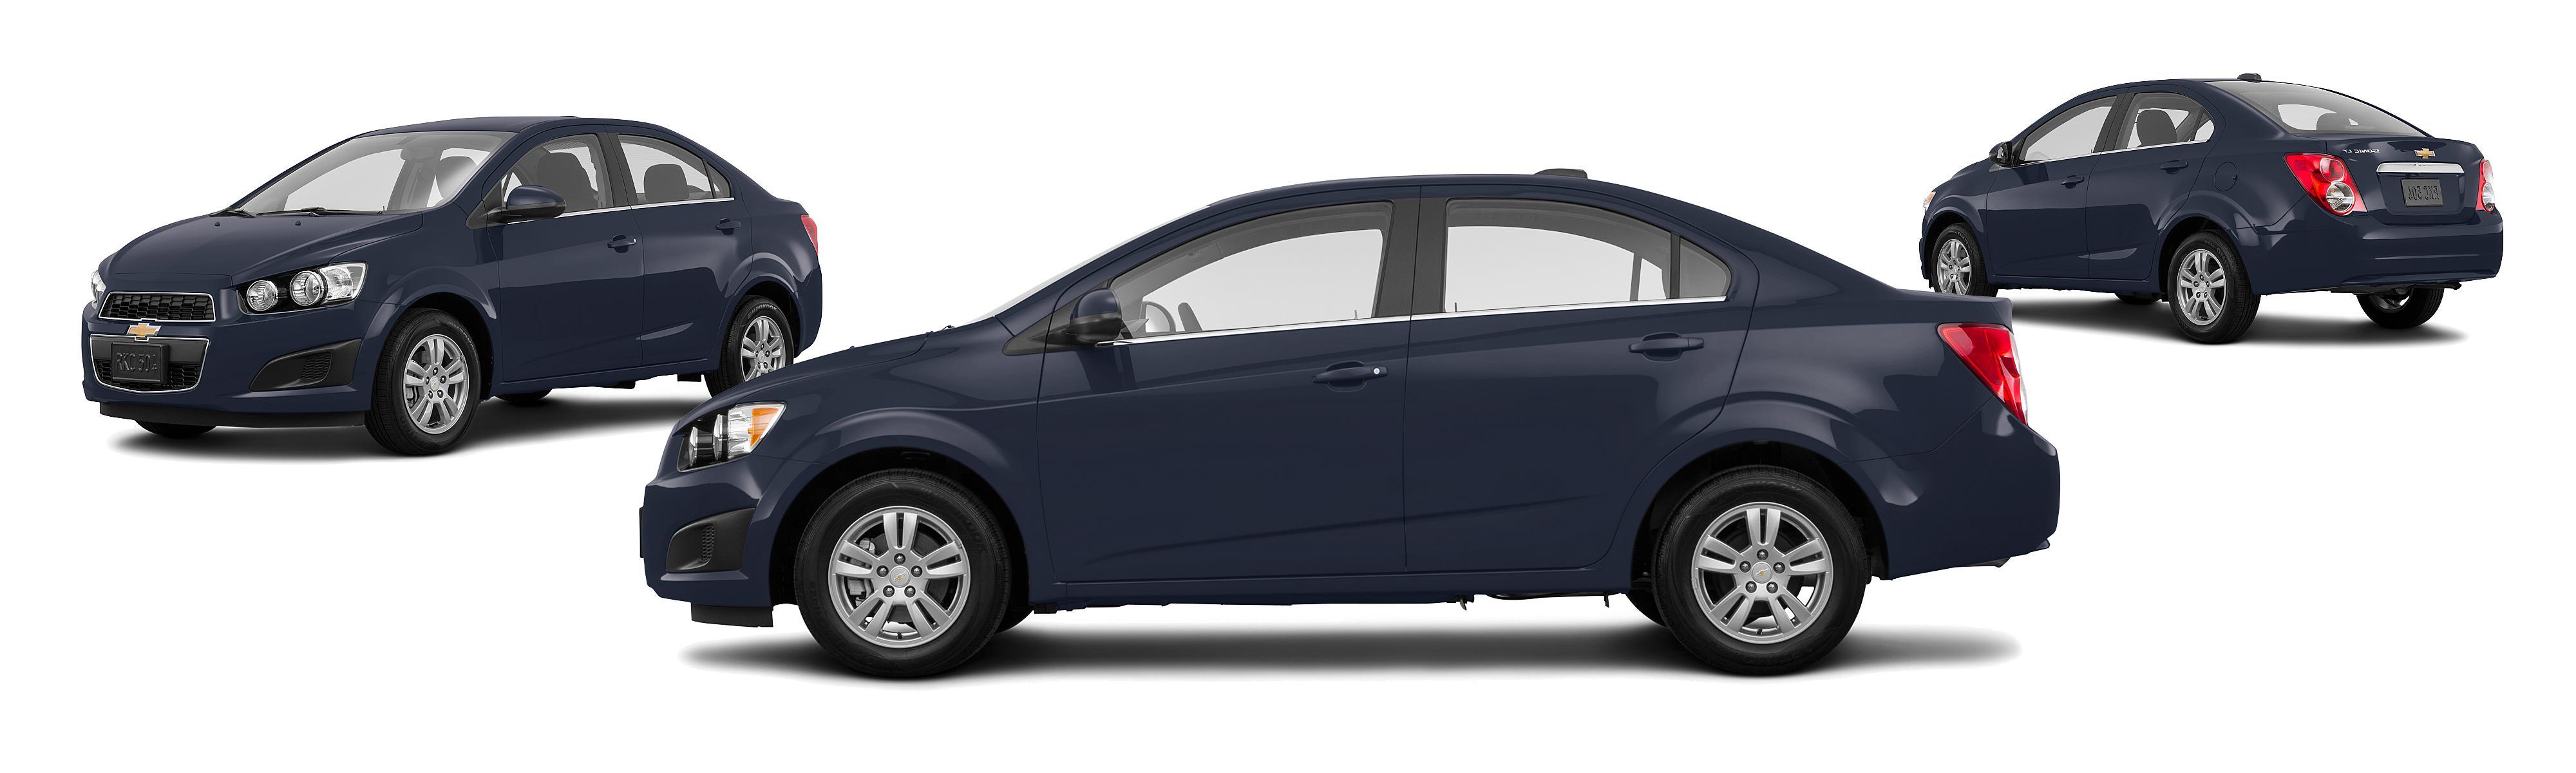 Chevrolet Sonic Repair Manual: Tire Inflation Description